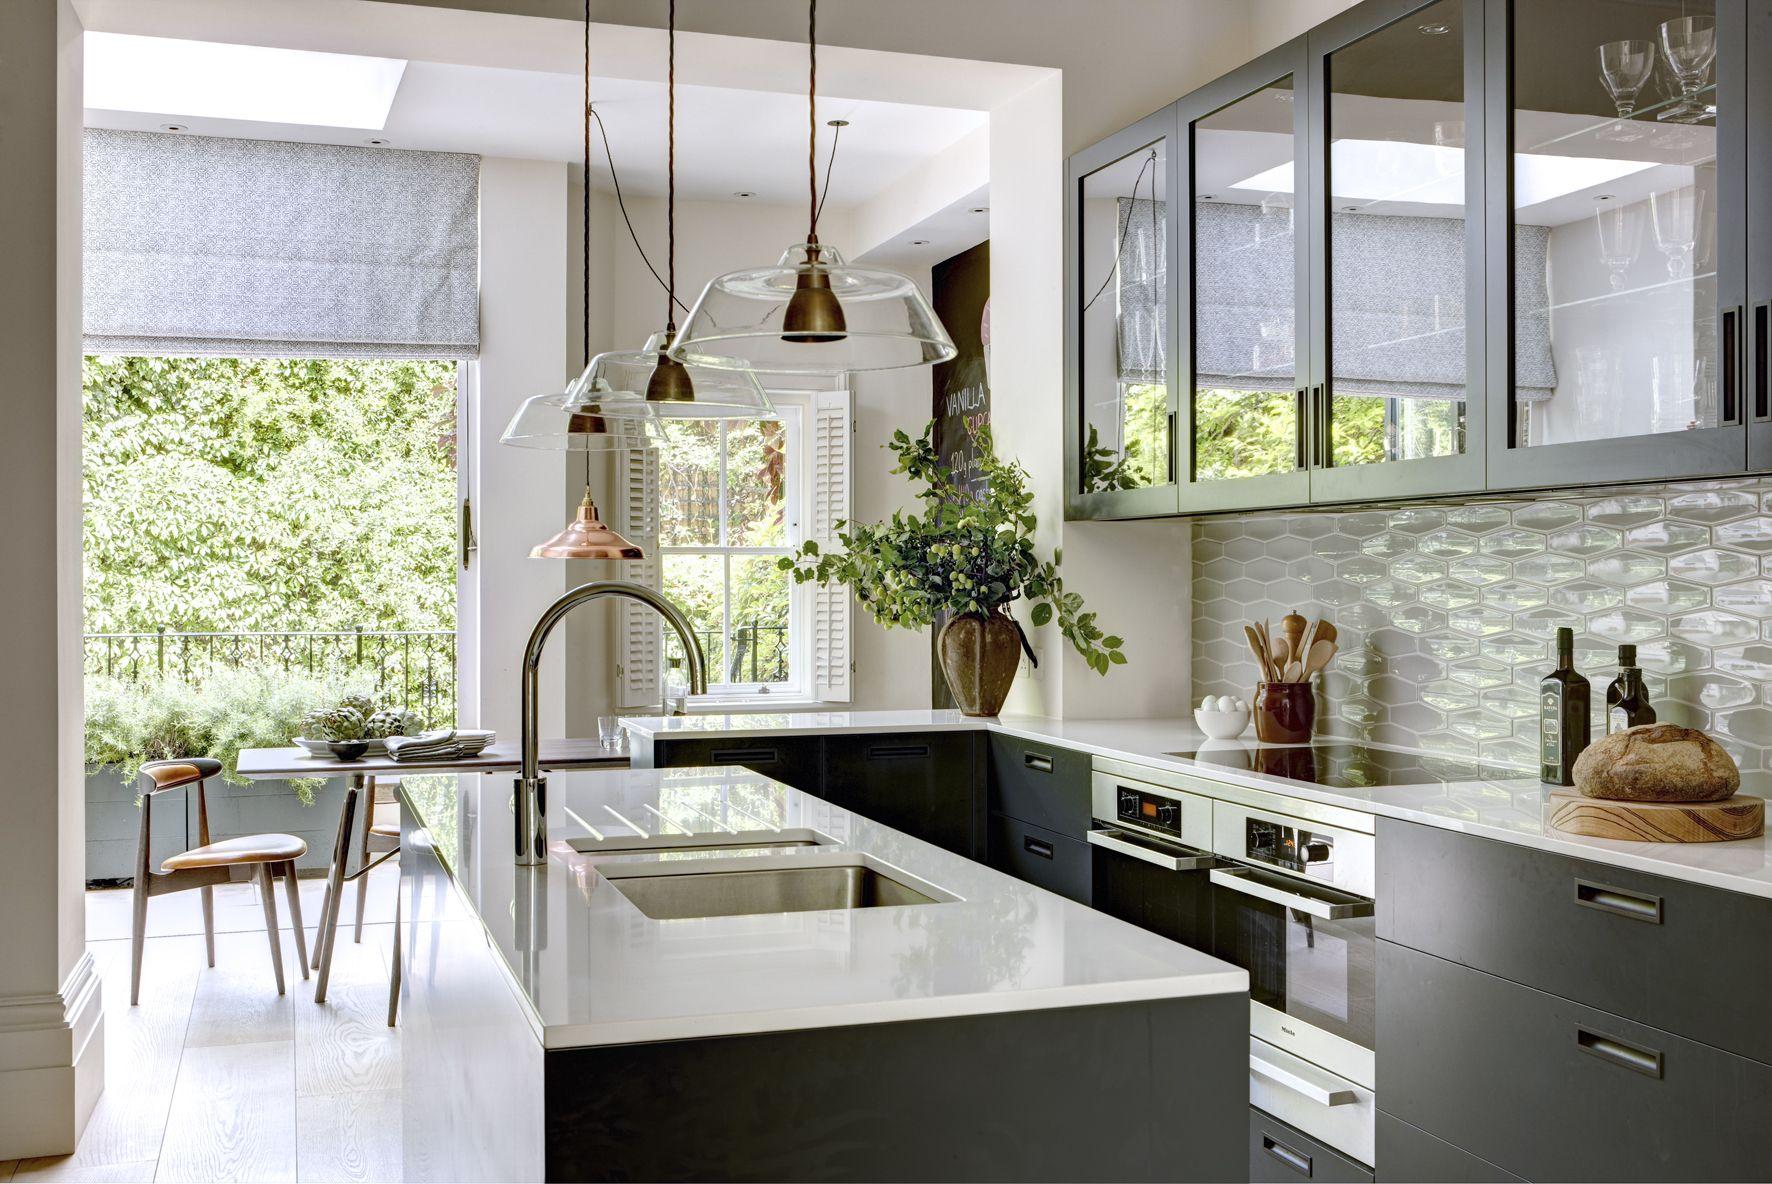 Spectacular Ikea K chenplaner Tipps f r richtige K chenplanung K che Interiors